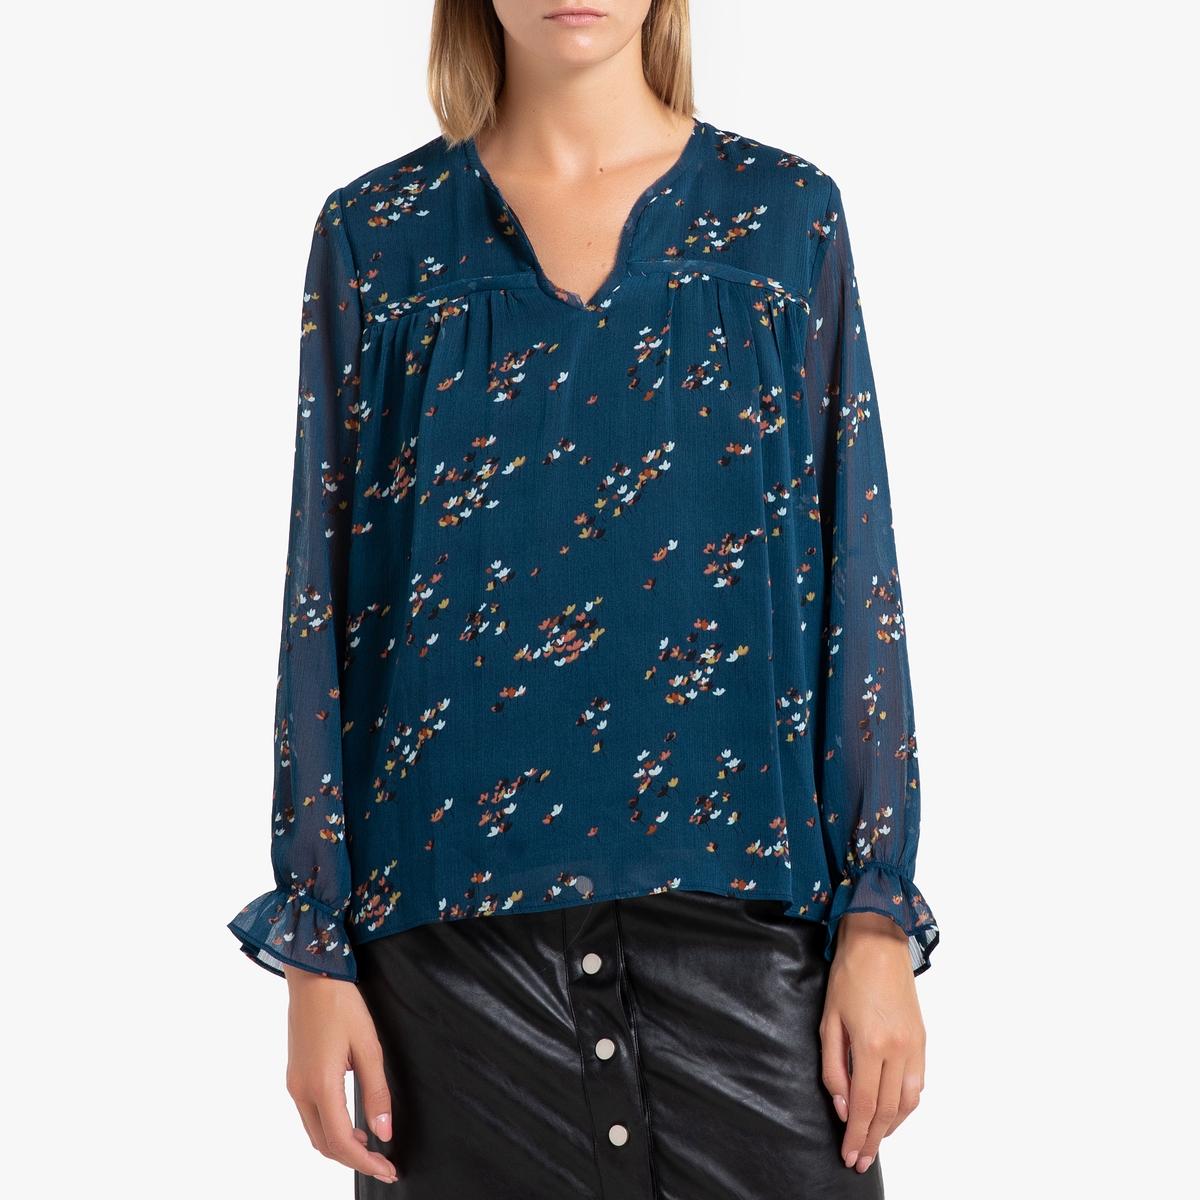 Блузка La Redoute С рисунком и длинными рукавами CALIS XS синий блуза la redoute с рисунком и длинными рукавами s синий